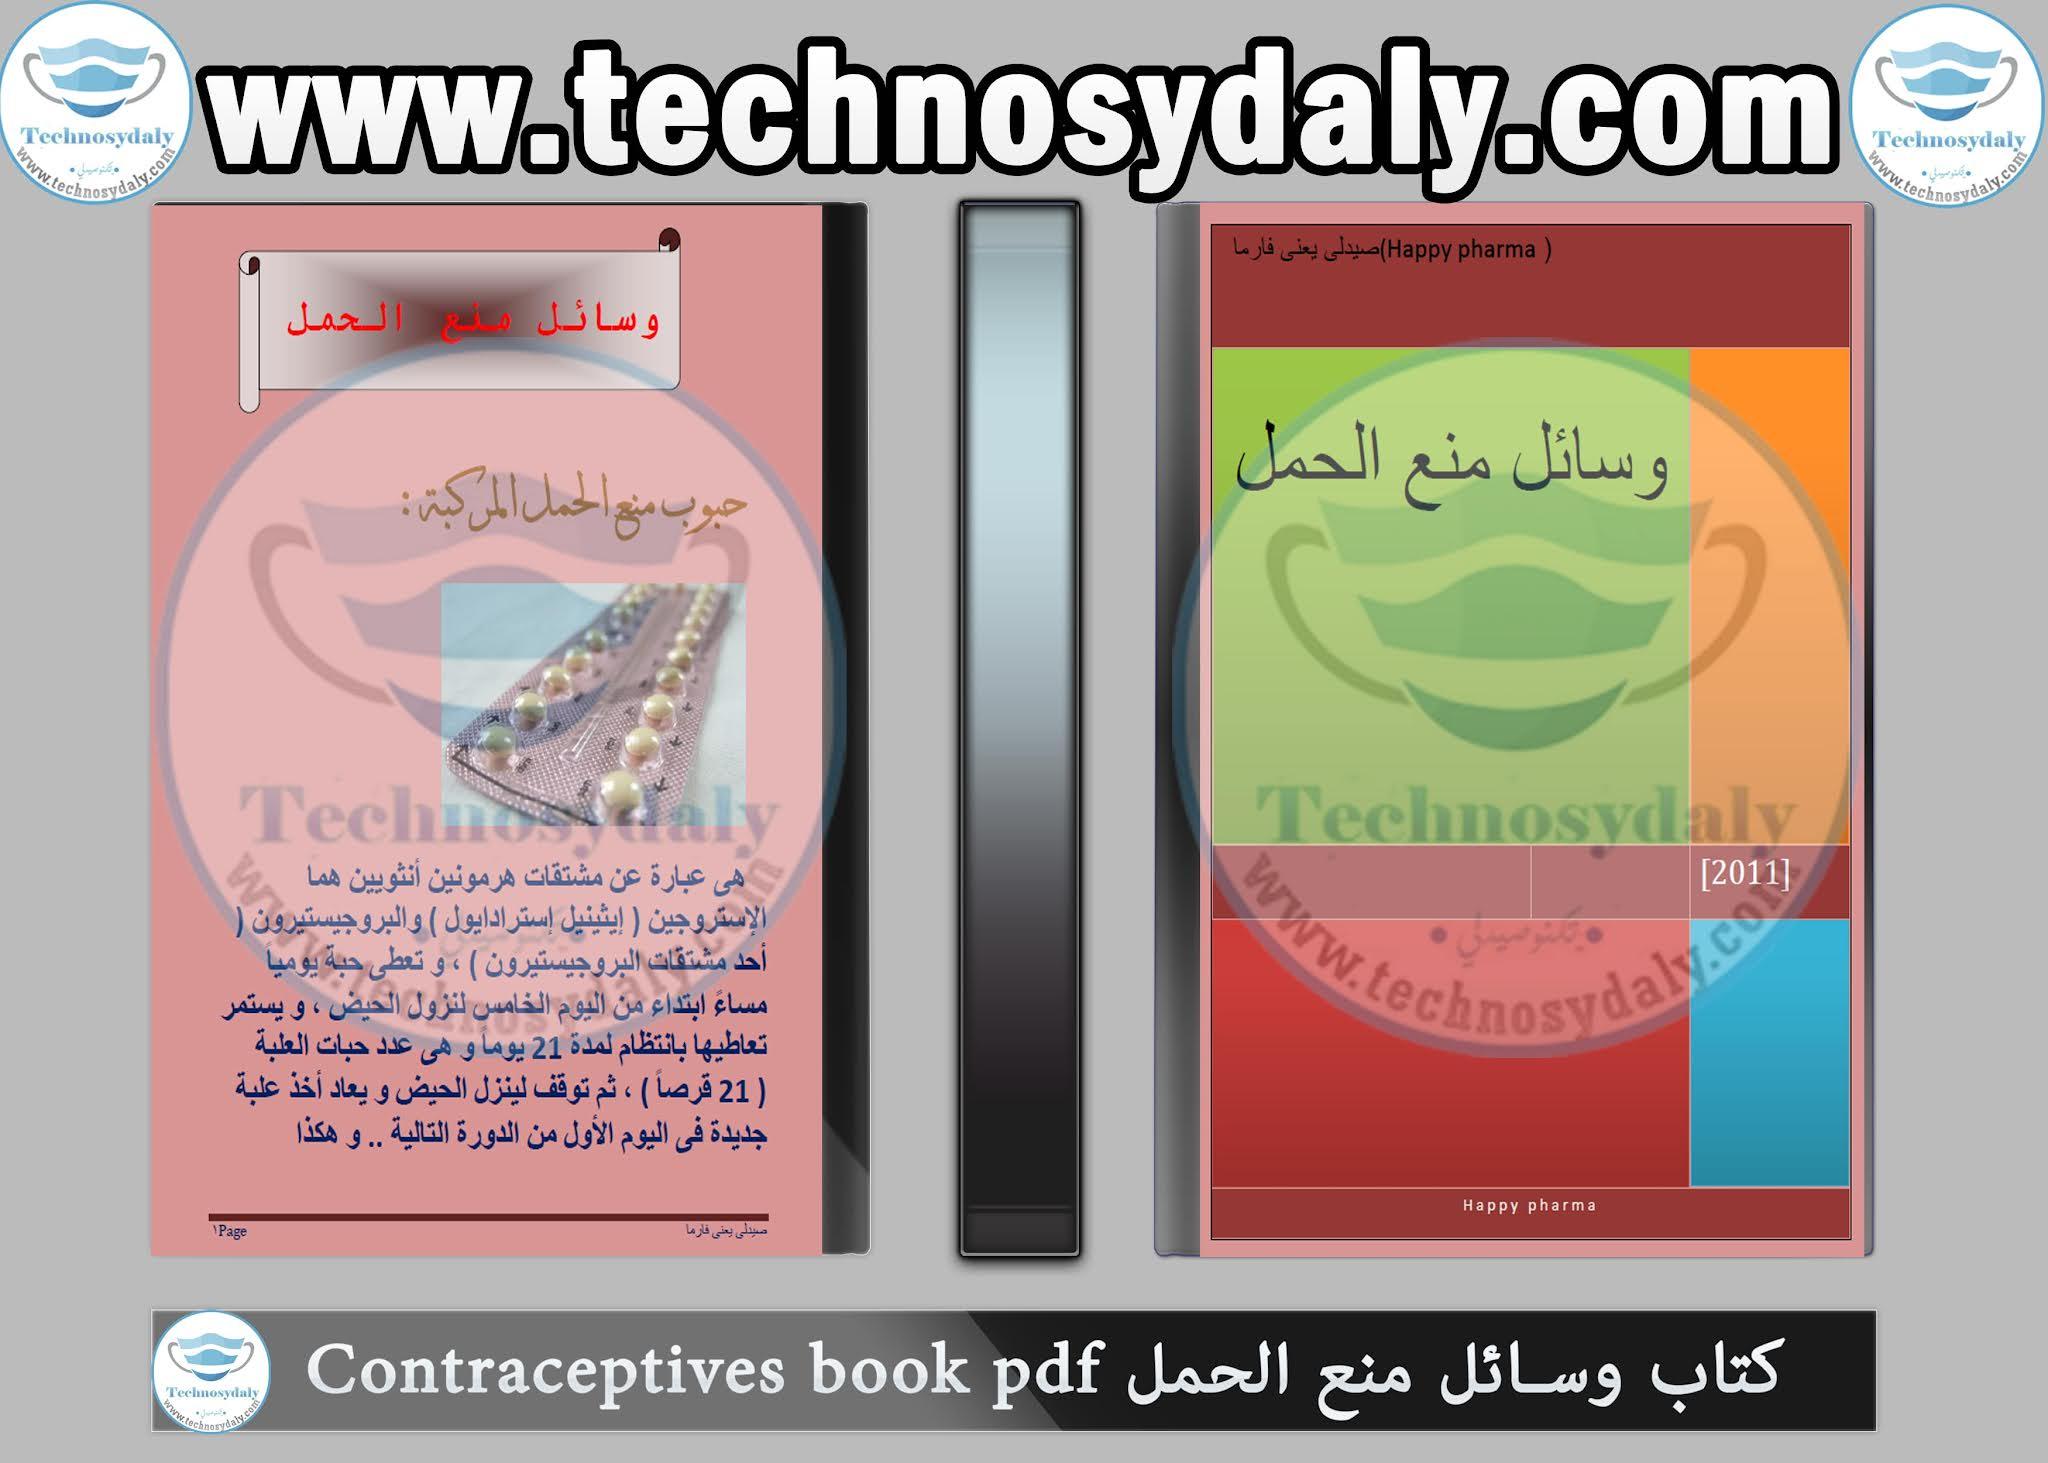 كتاب وسائل منع الحمل Contraceptives book pdf